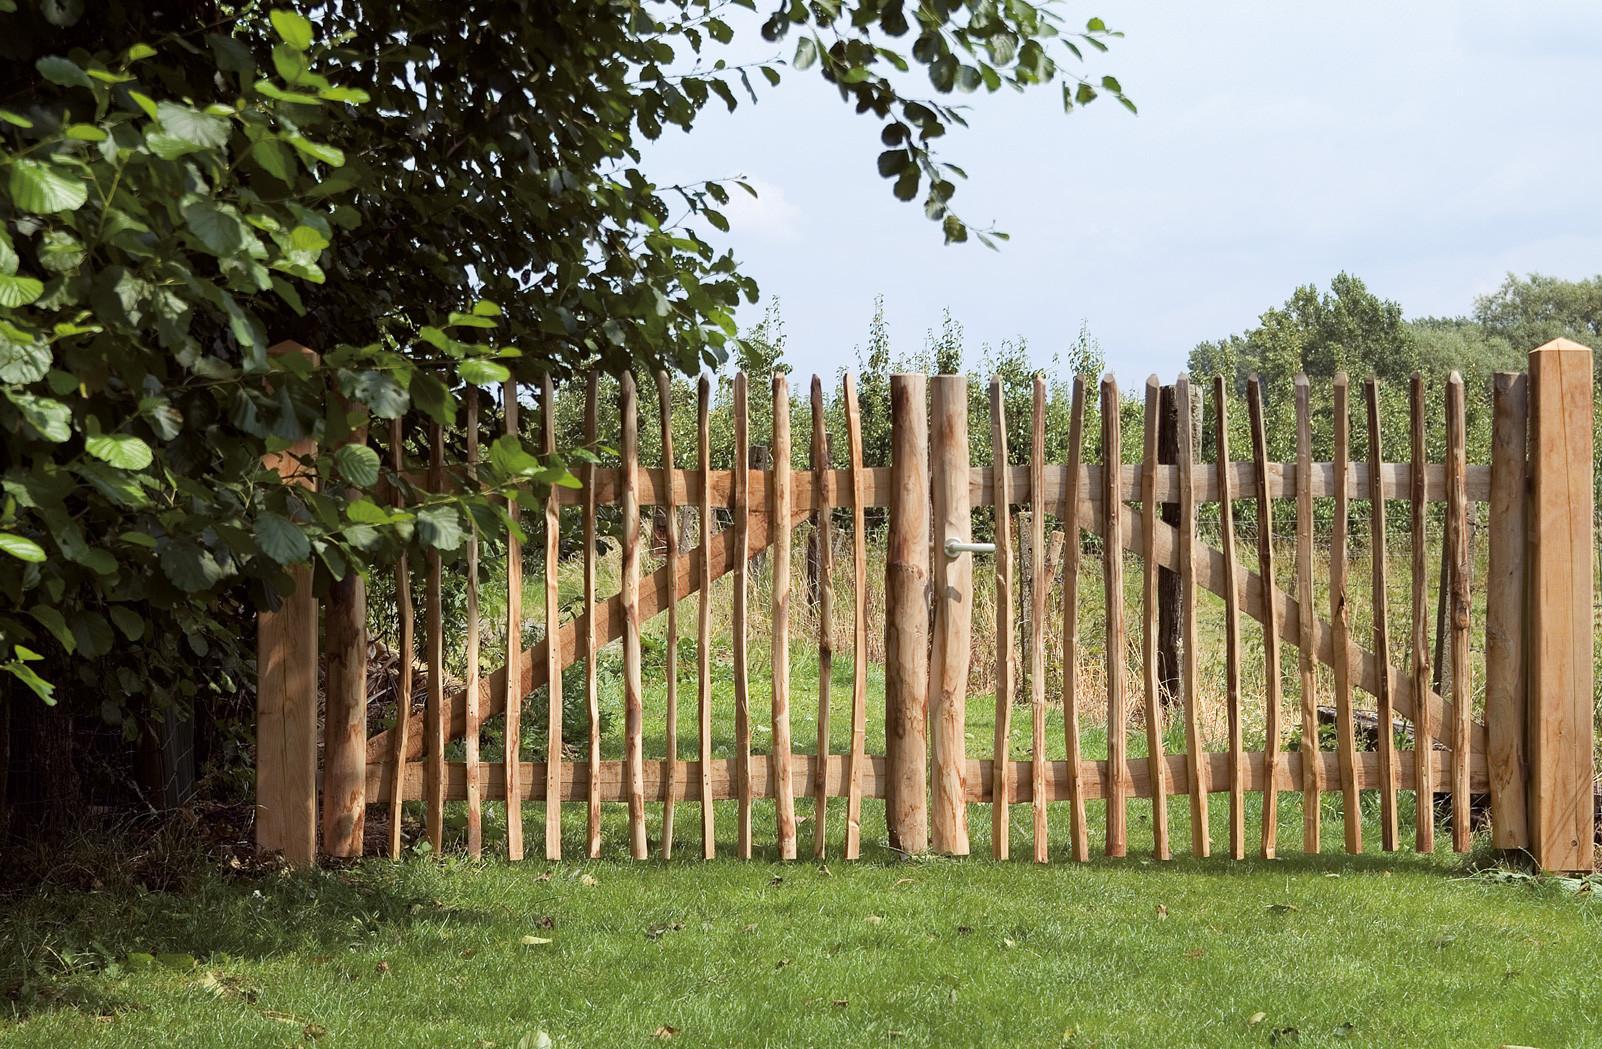 kastanjehouten poort